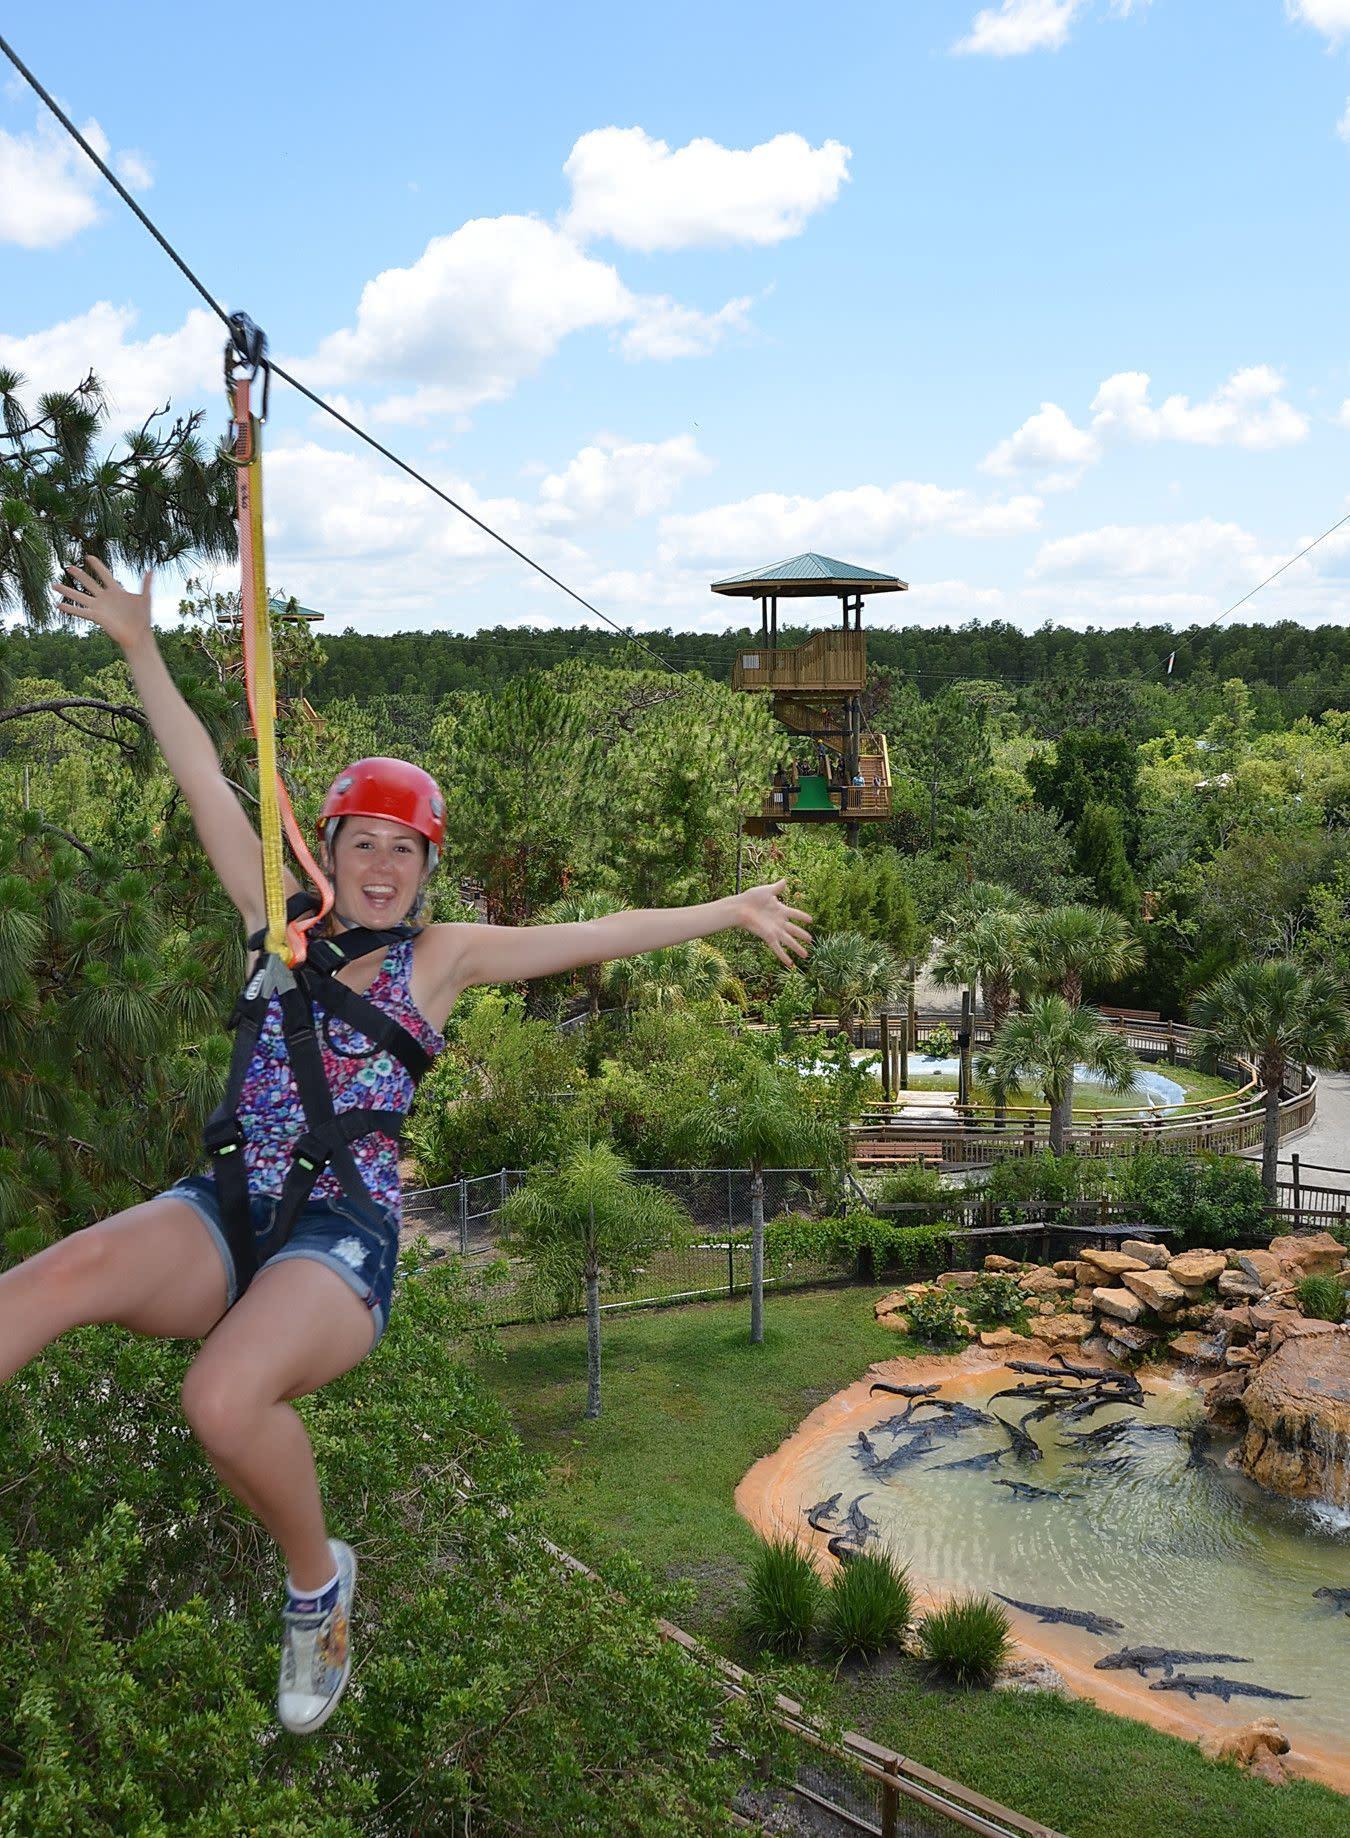 Screamin' Gator Zip Line at Gatorland in Orlando